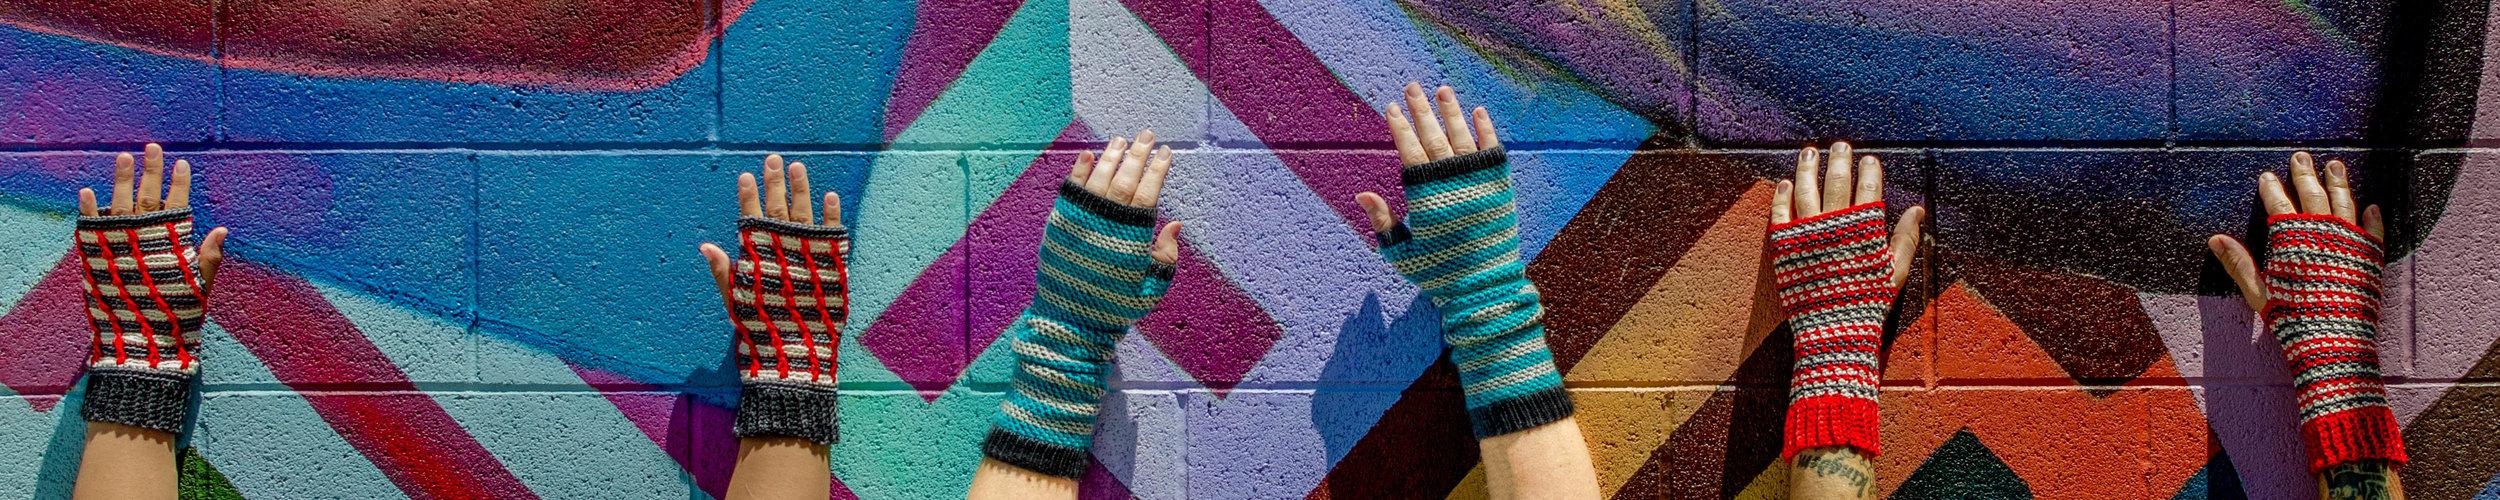 window glass roots radical dancing stripes fingerless gloves anzula linda dean knitsy knits serenity squishy.jpg